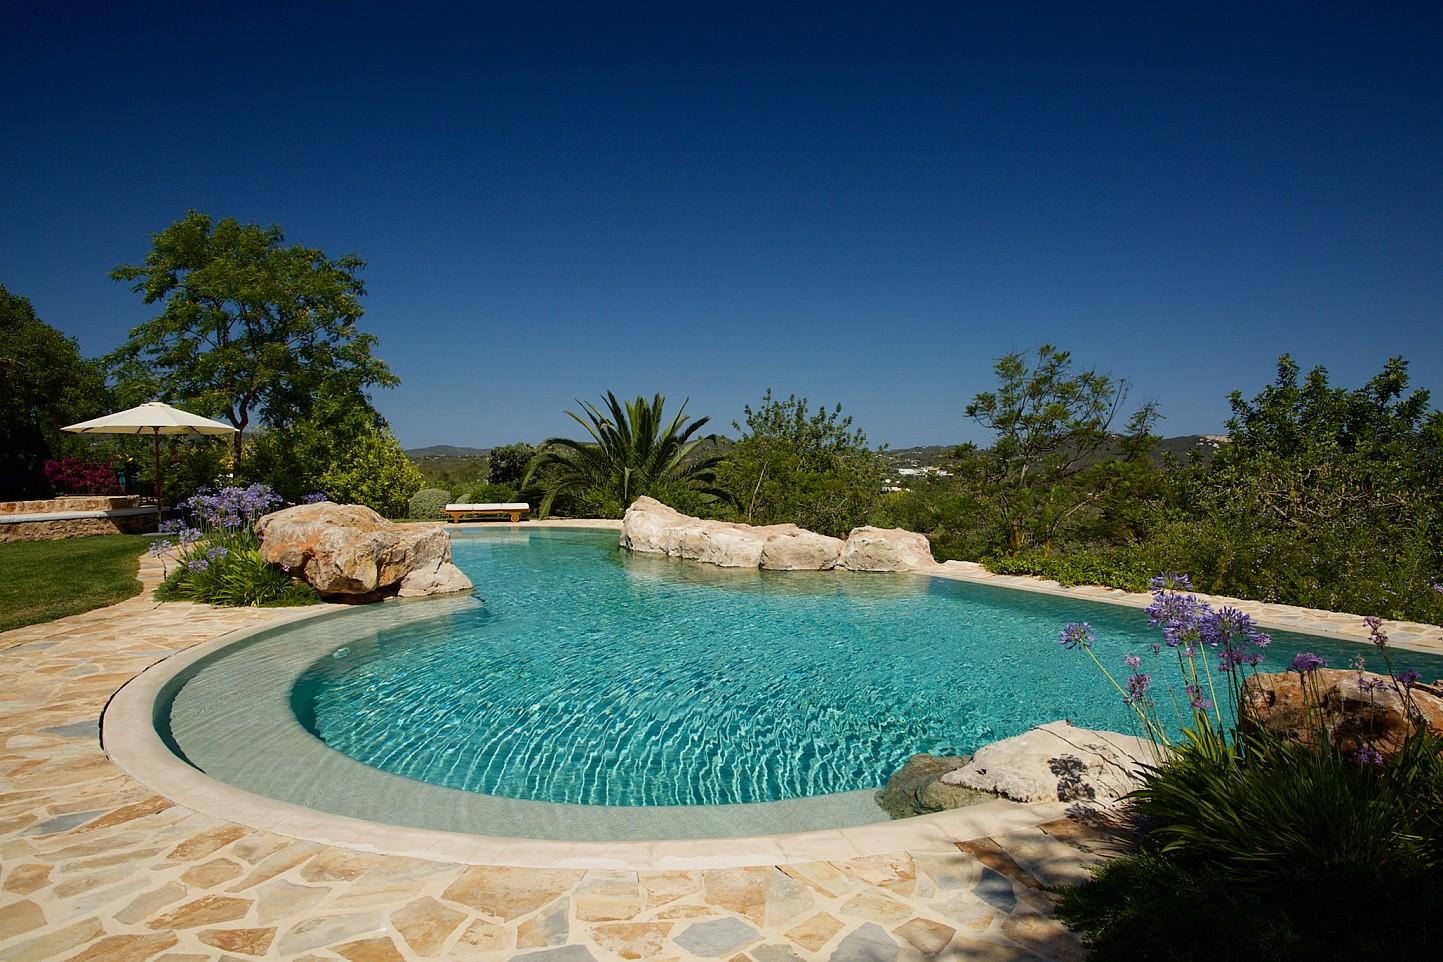 Magnífica piscina de pedra